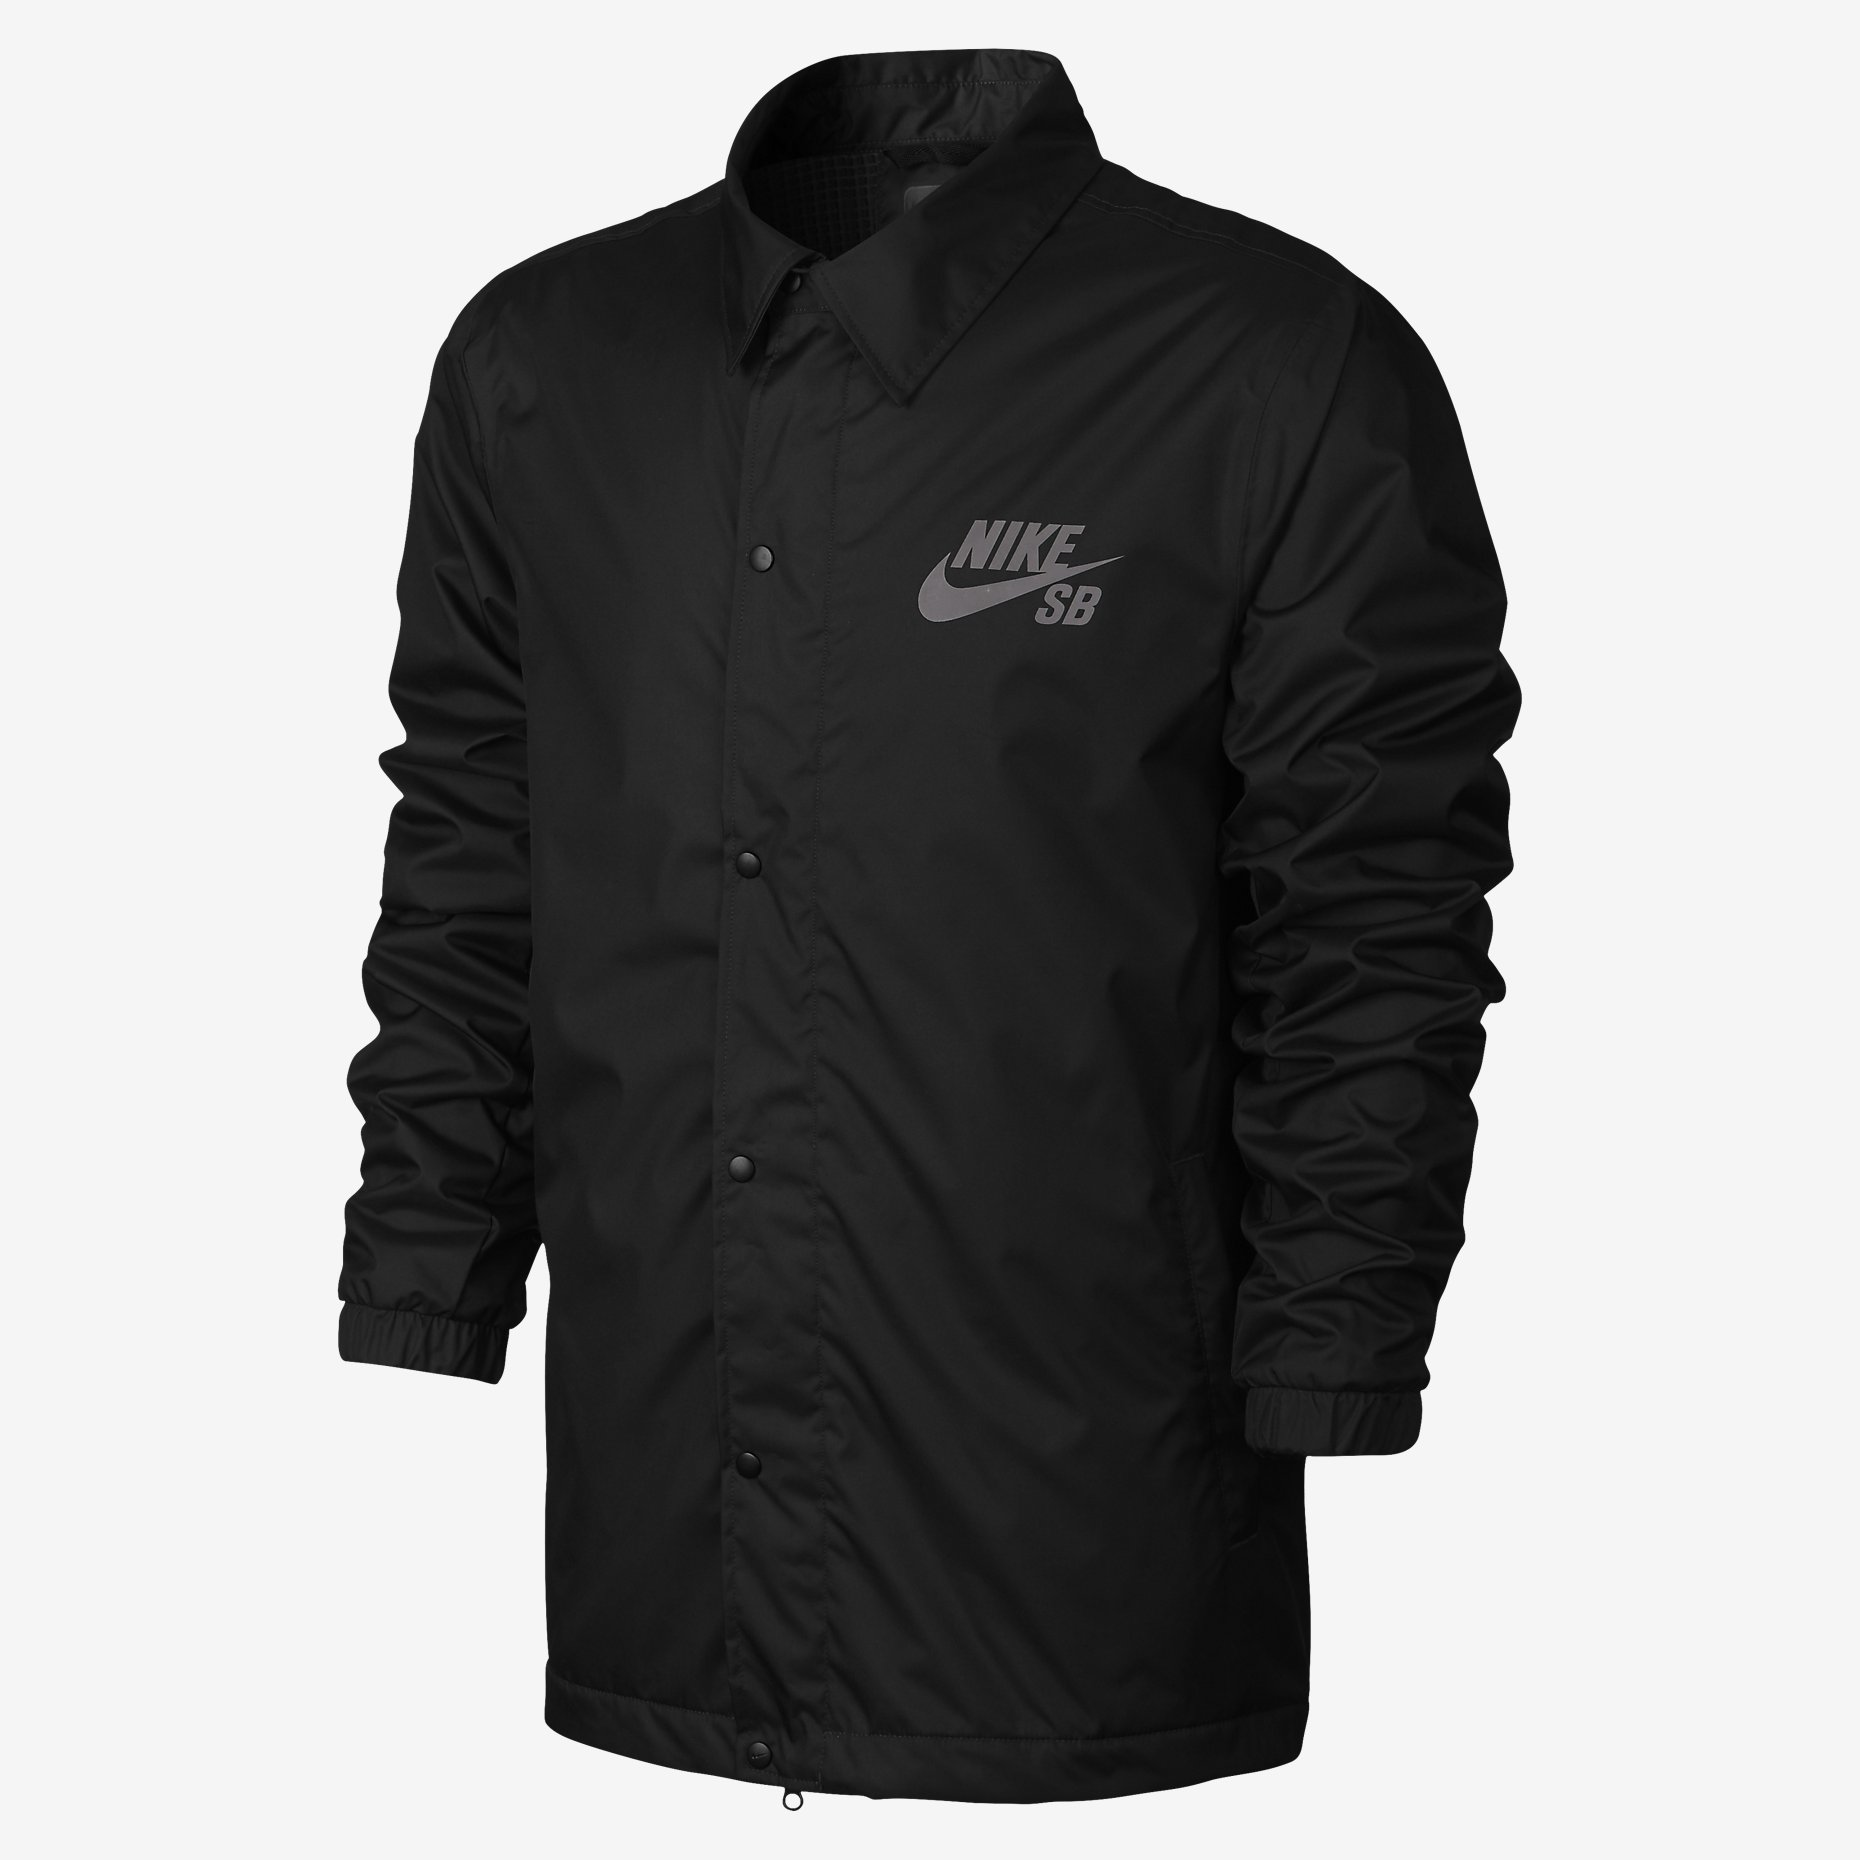 snowboard jackets nike sb assistant coaches snowboard jacket cdfyjxg